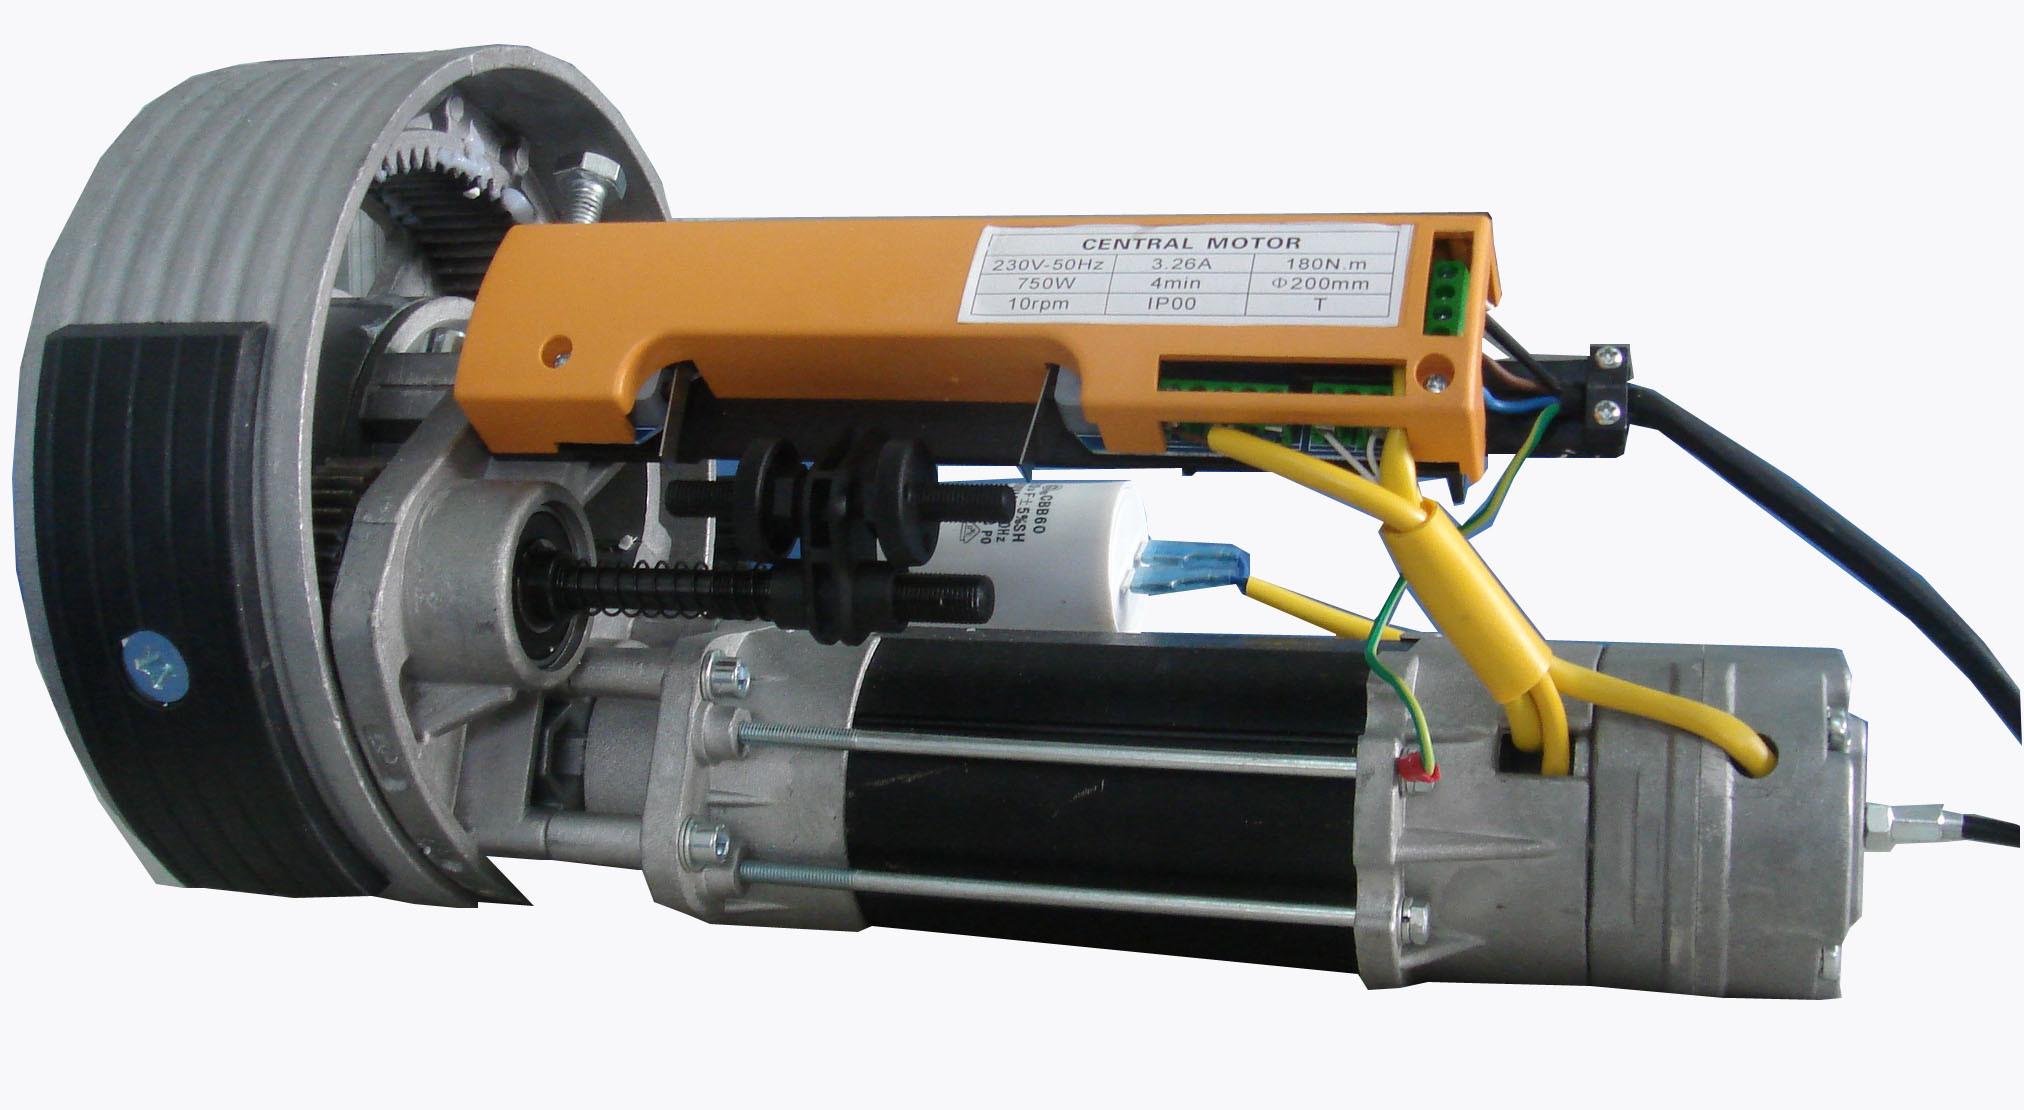 Easy to Install and Conveniet Central Roller Shutter Door Motor